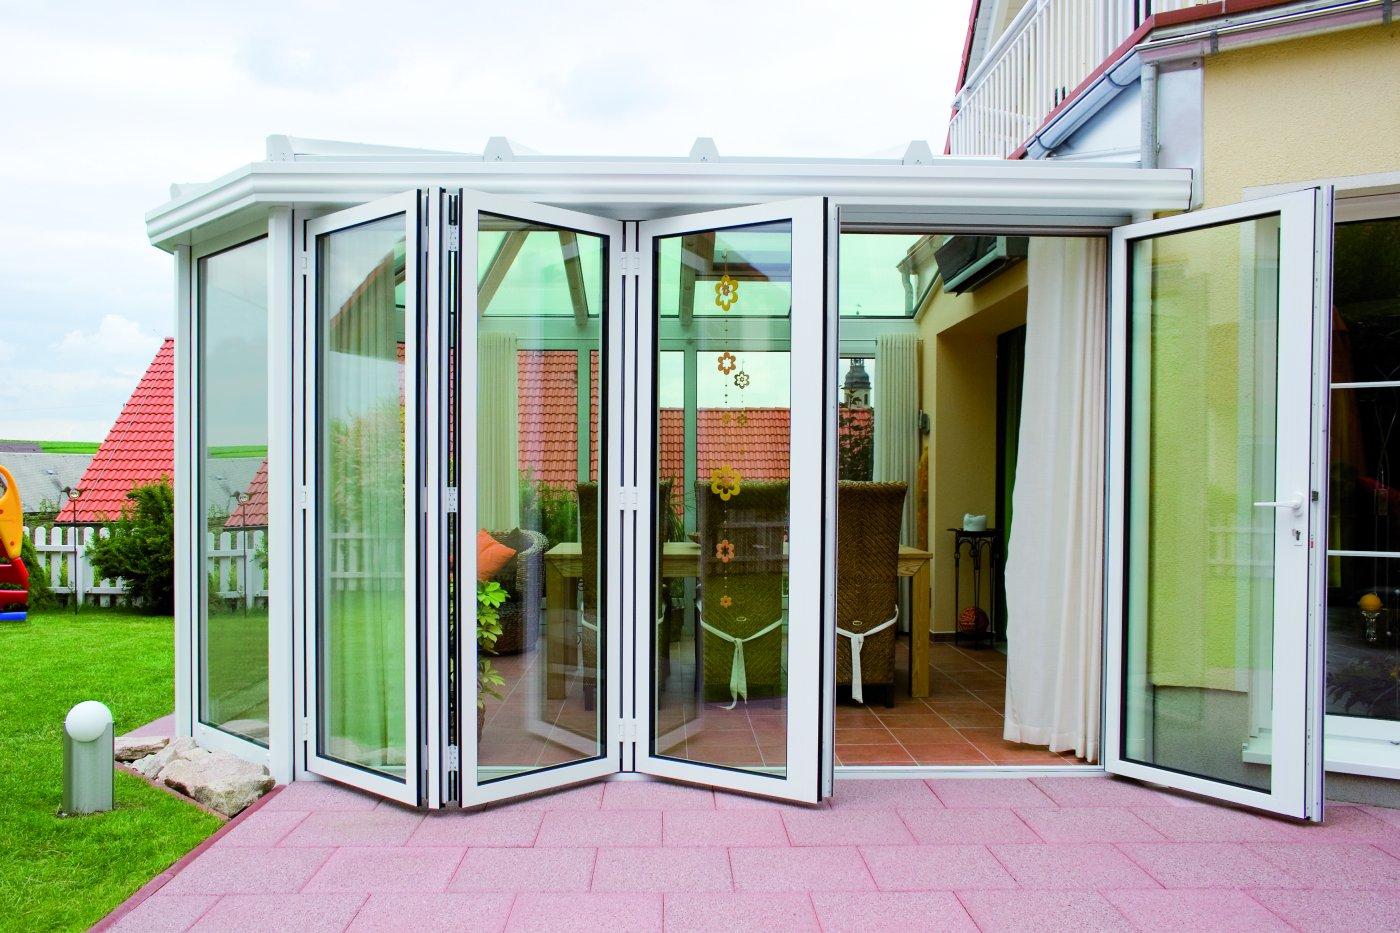 Остекление балкона системой slidors размер 3000 на 800 на 15.